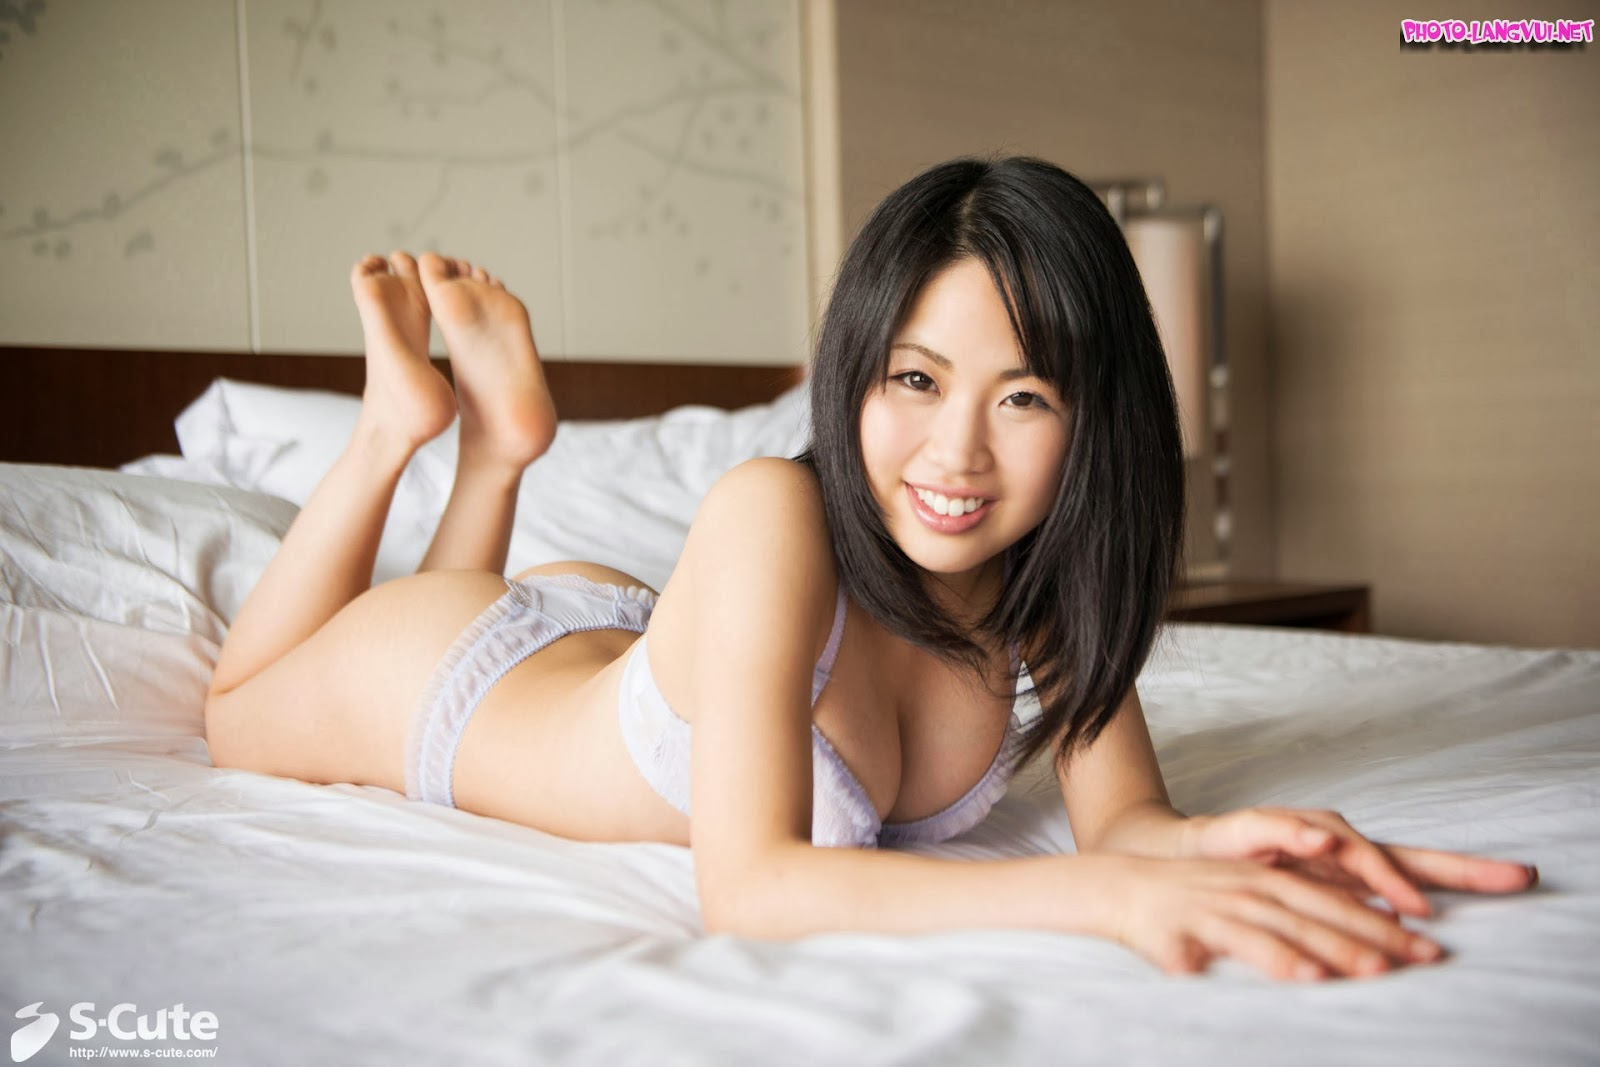 S-Cute Kana